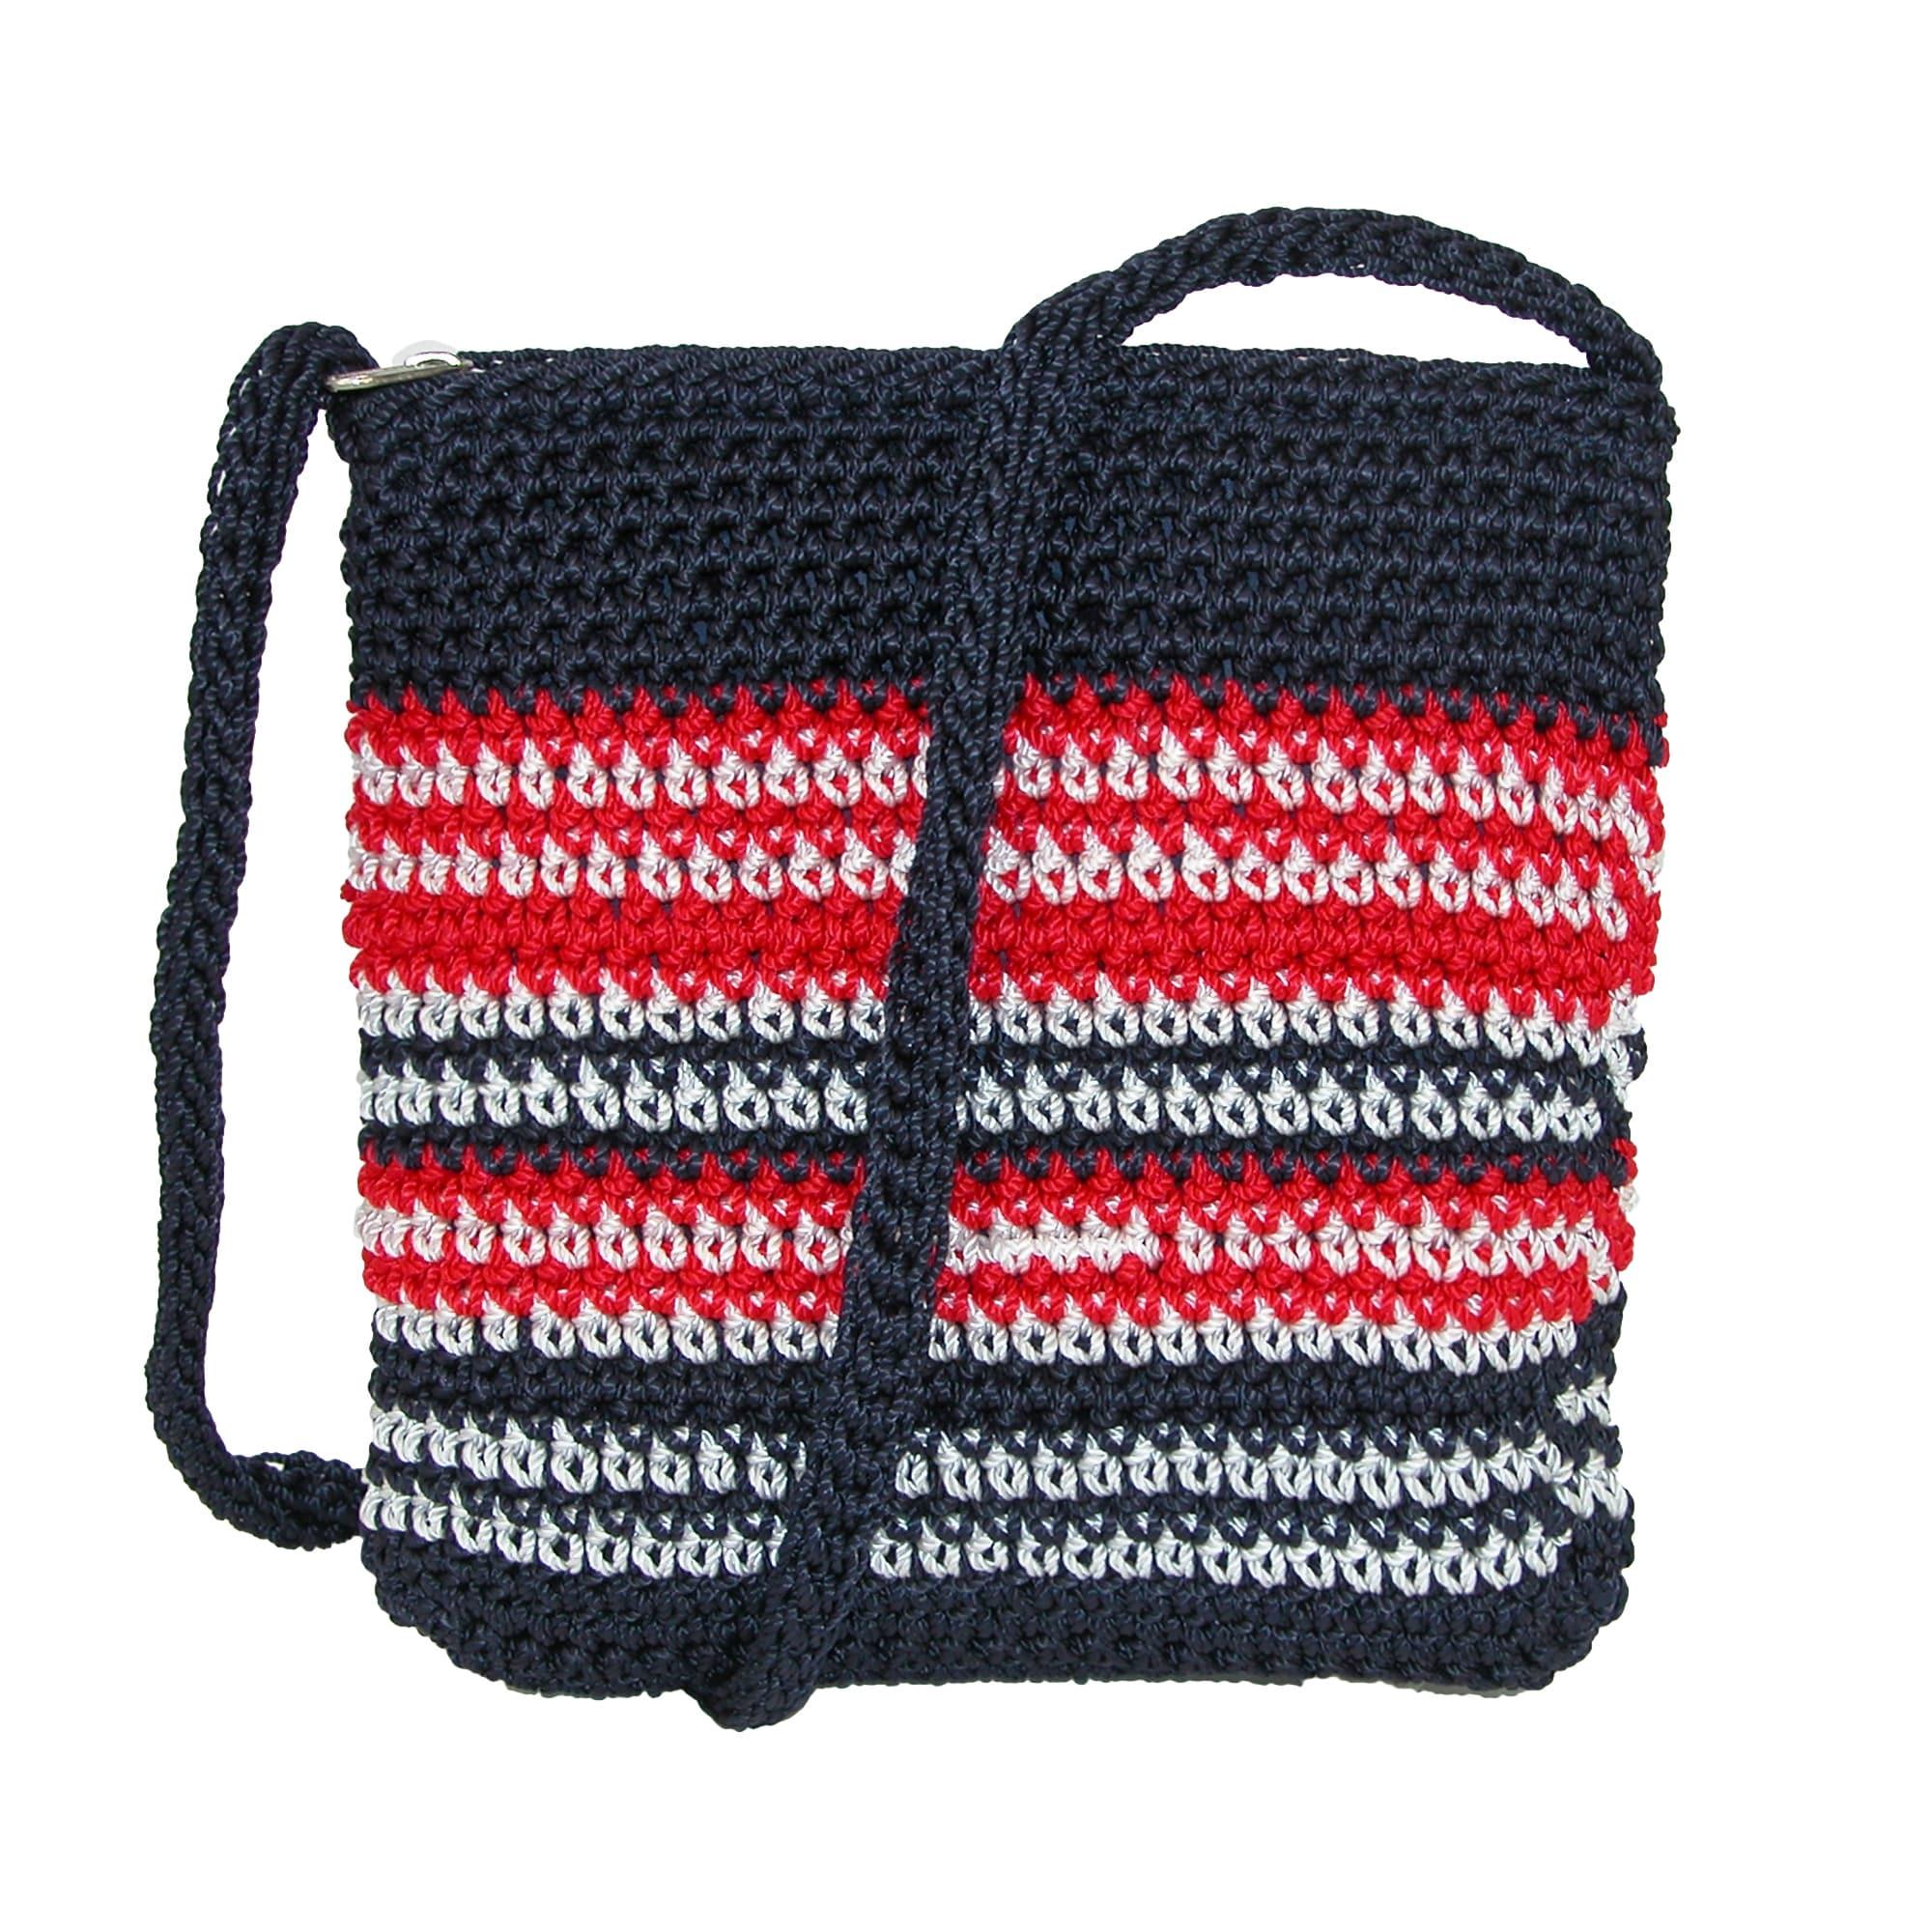 Shop Dynamic Asia Striped Crochet Cross Body Handbag One Size